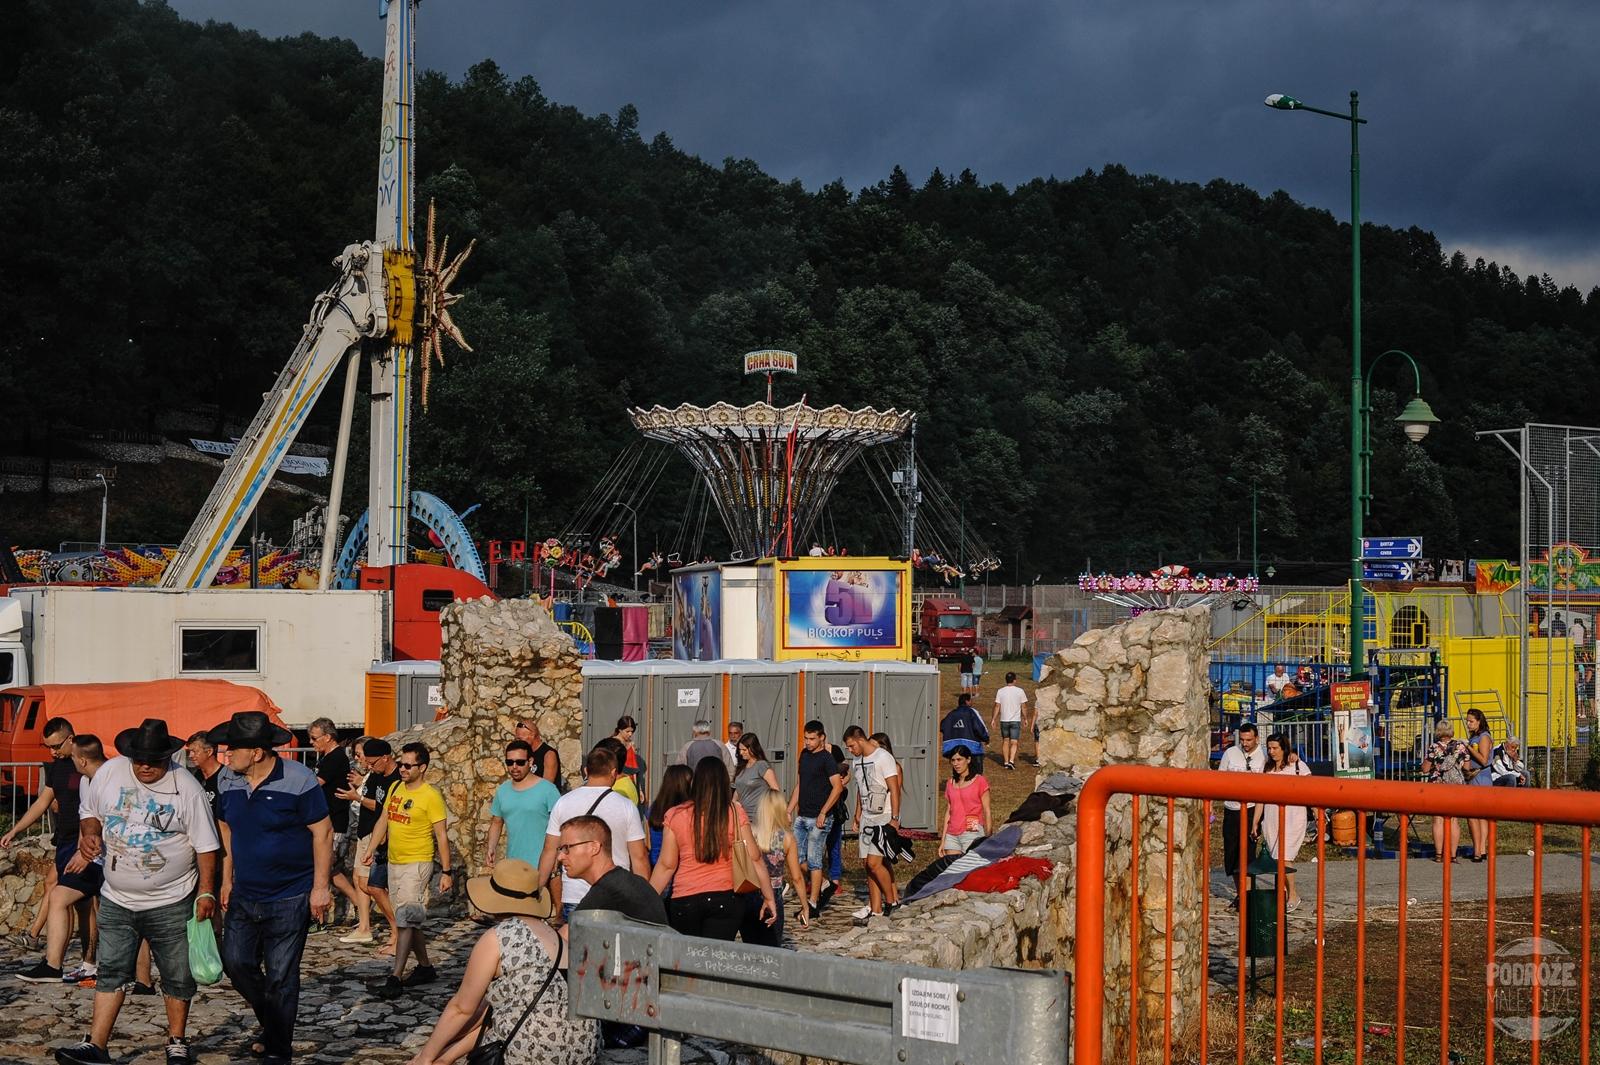 Serbia festiwal trąb w Guca